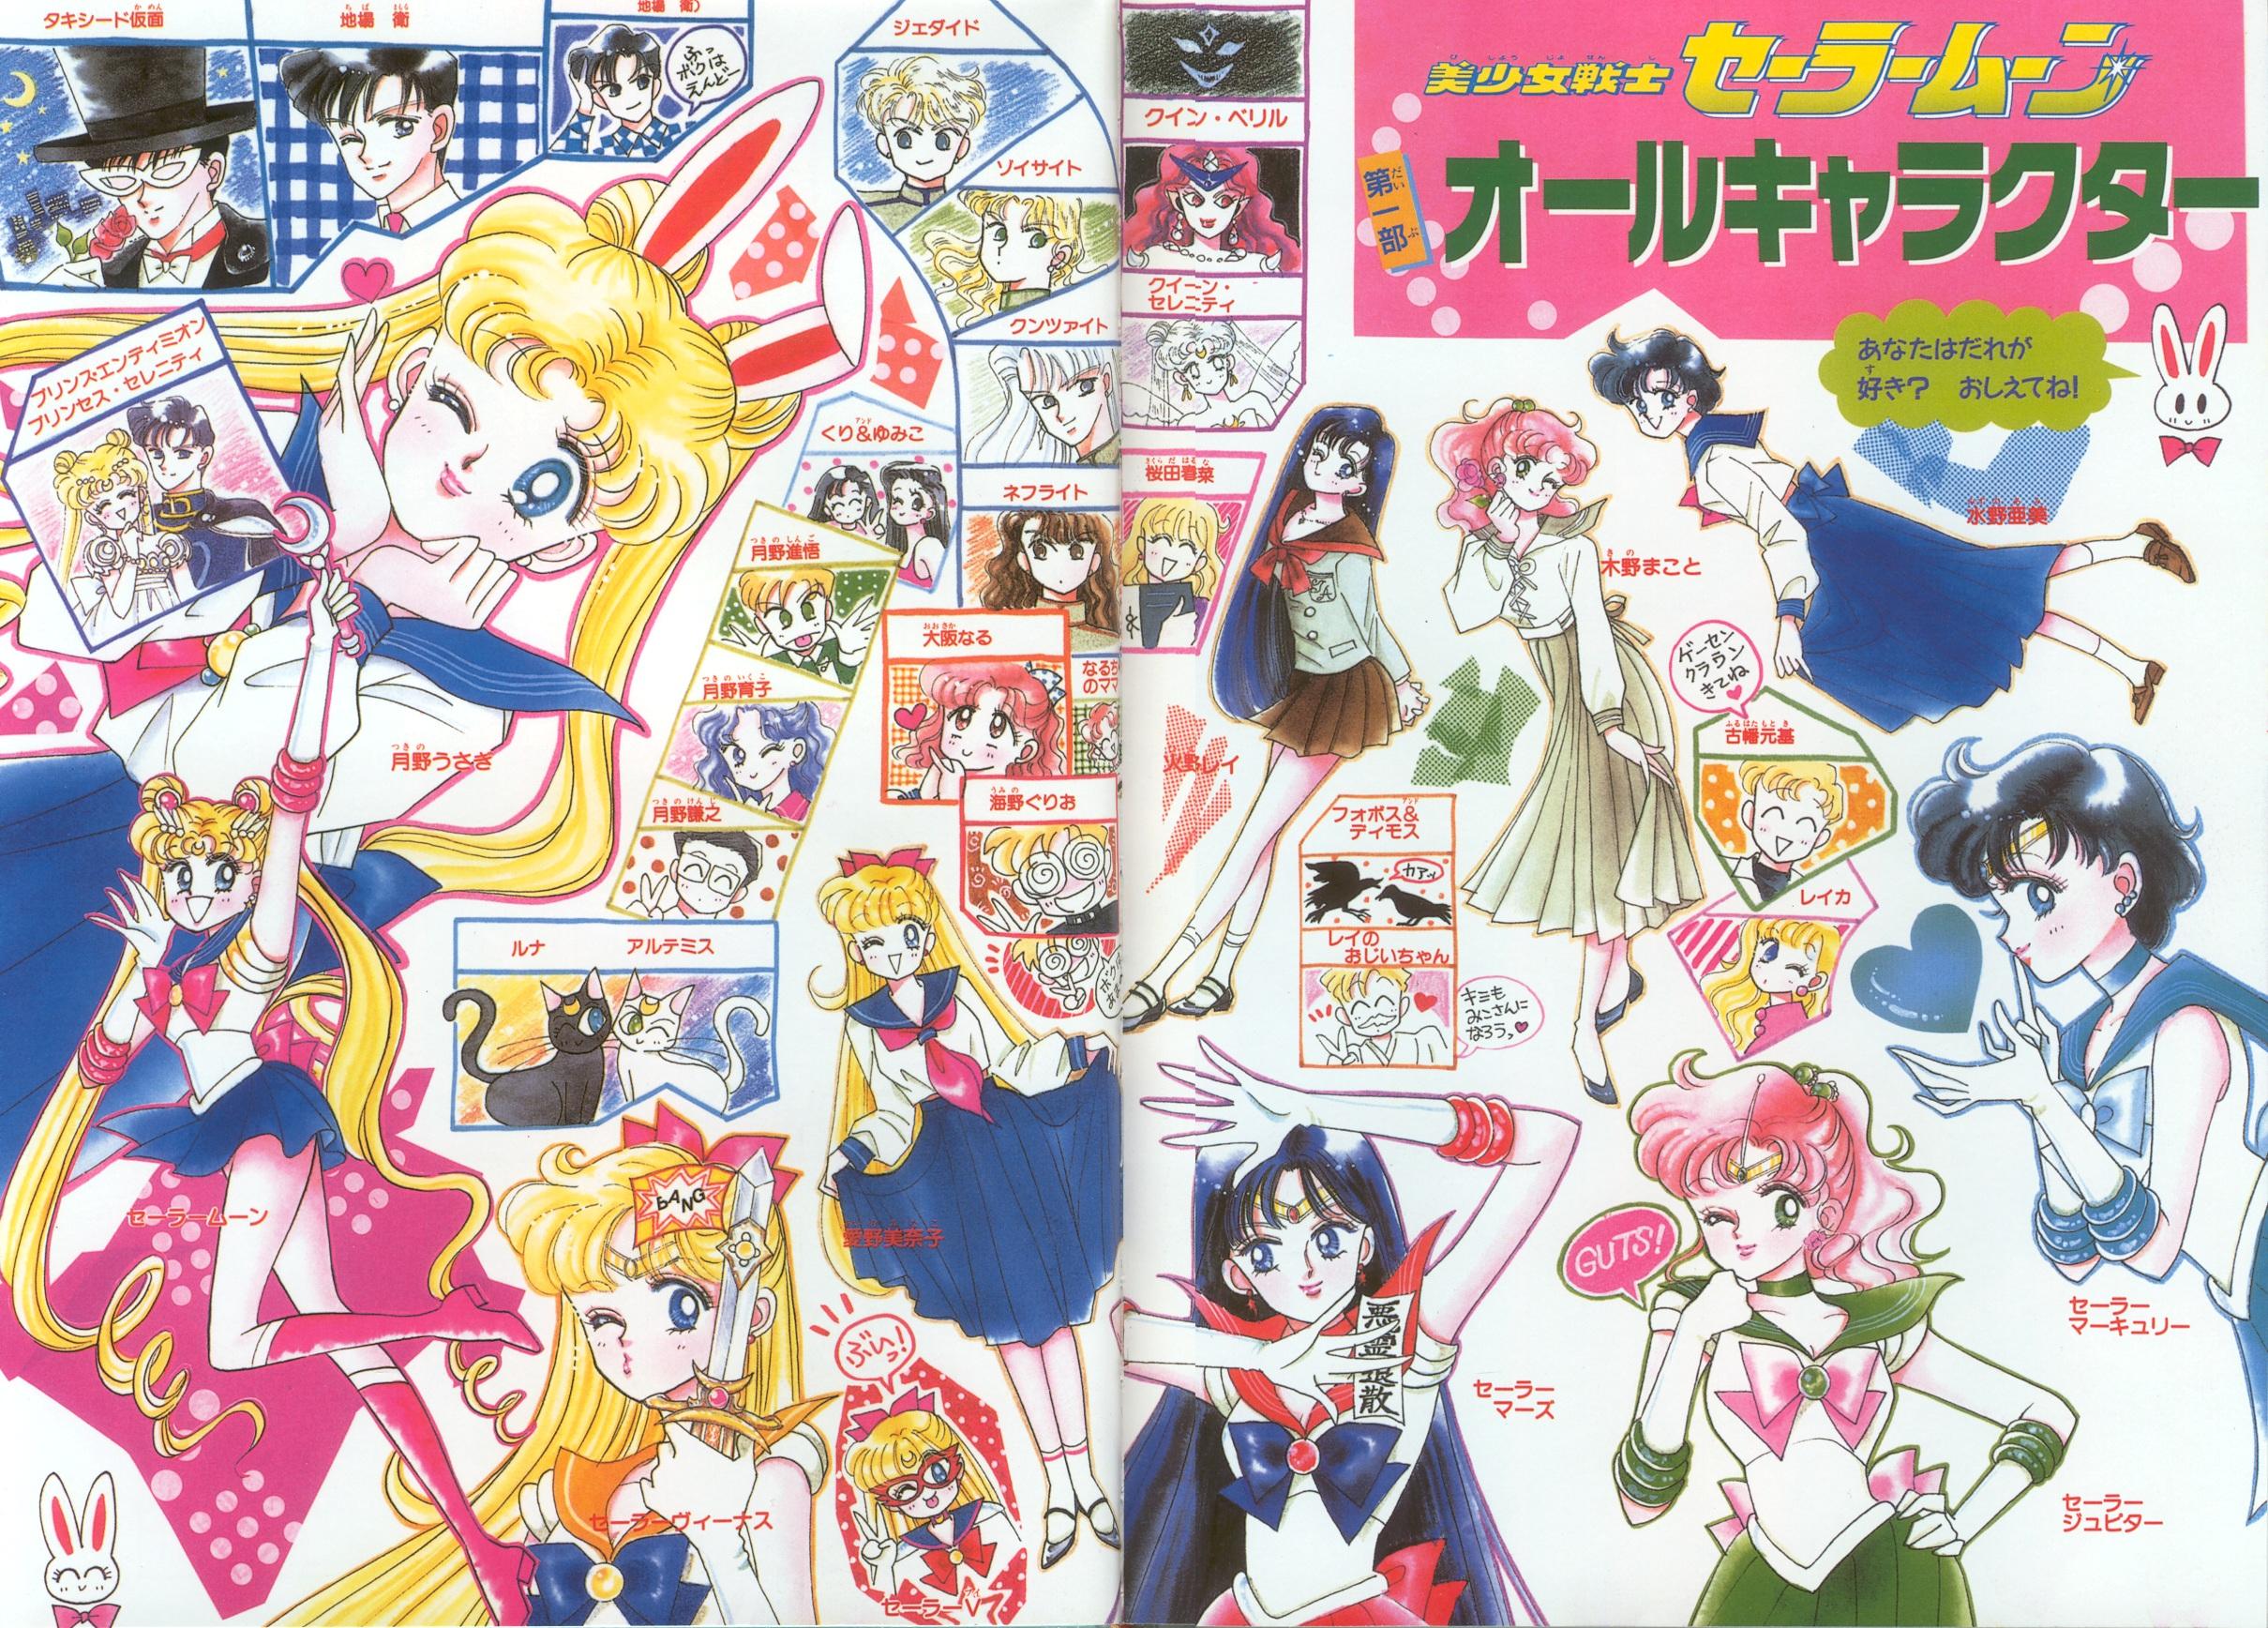 Mamoru chiba sailor moon wiki fandom powered by wikia gallery biocorpaavc Images